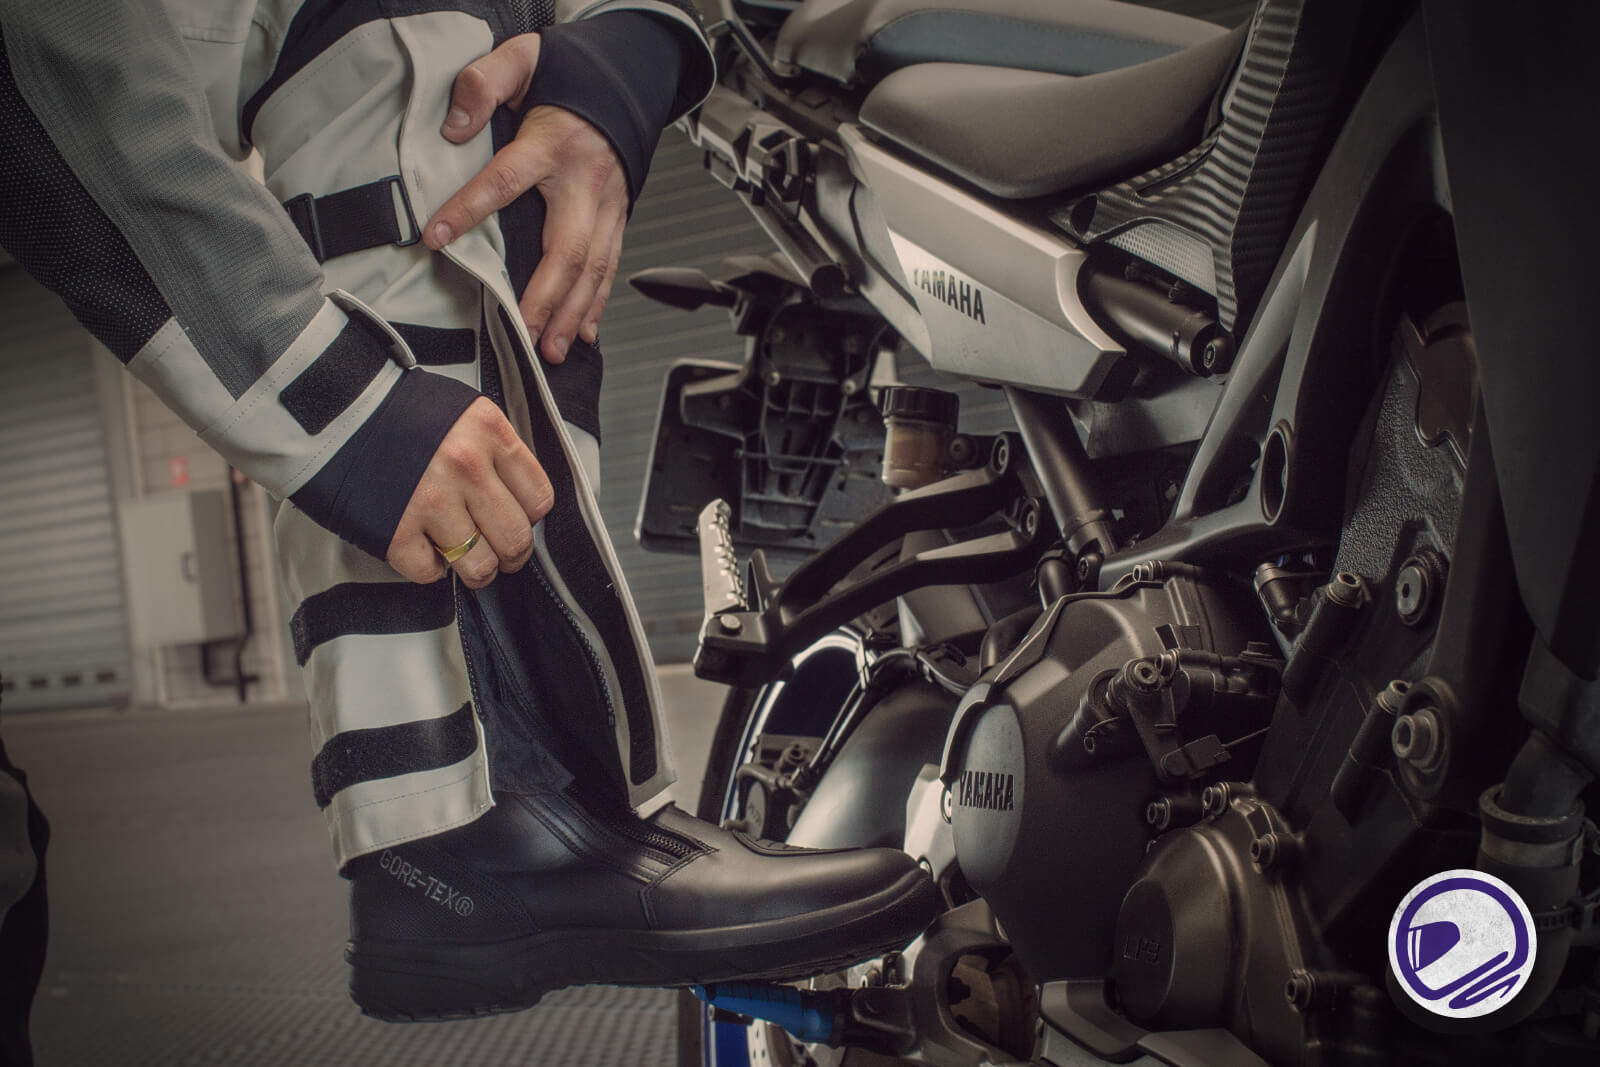 Motorkledingcenter motoroufit adventure tour rijder daytona